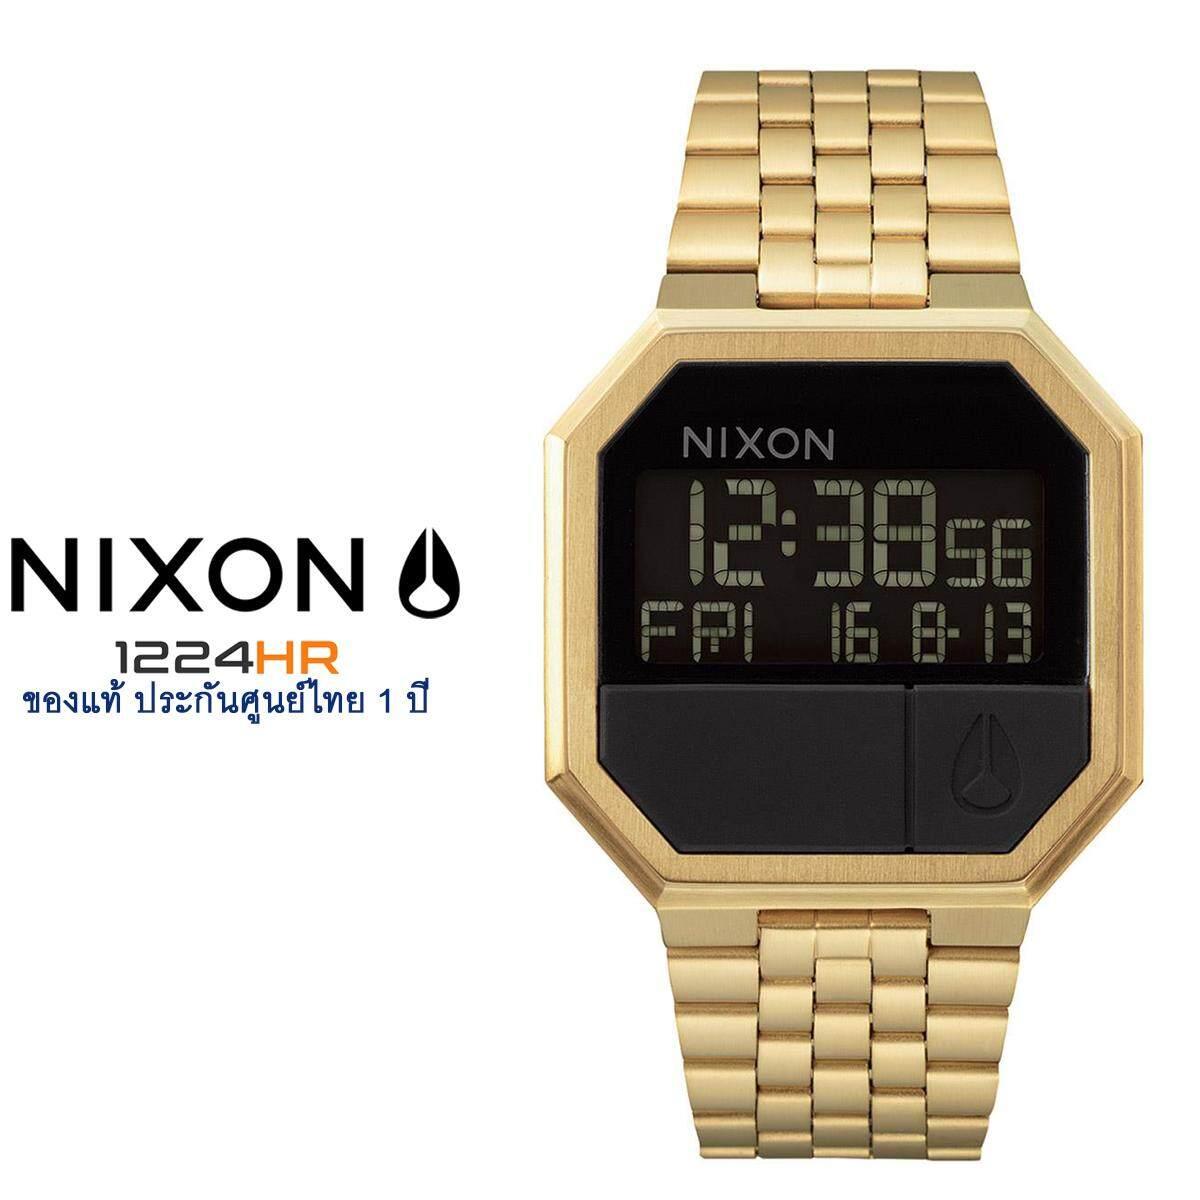 Nixon RE-RUN A158502-00 นาฬิกา Nixon ของแท้ รับประกันศูนย์ 1 ปี 12/24HR